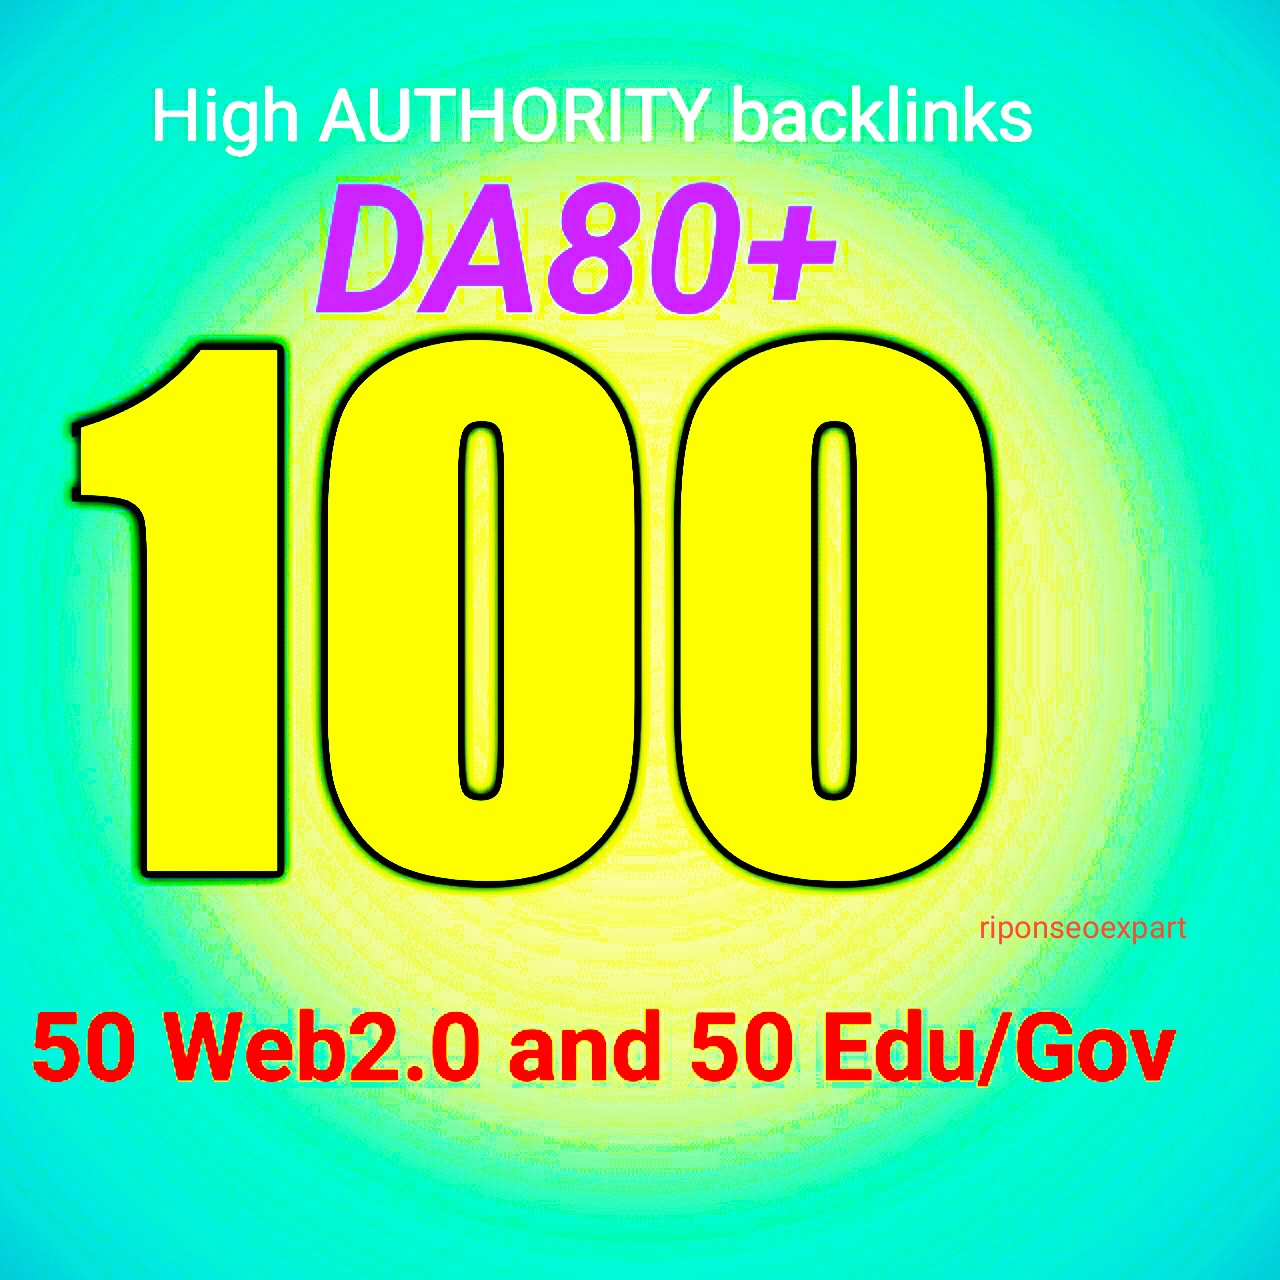 Build 100 high authority link 50 web2.0 and 50 edu DA80+ Backlink